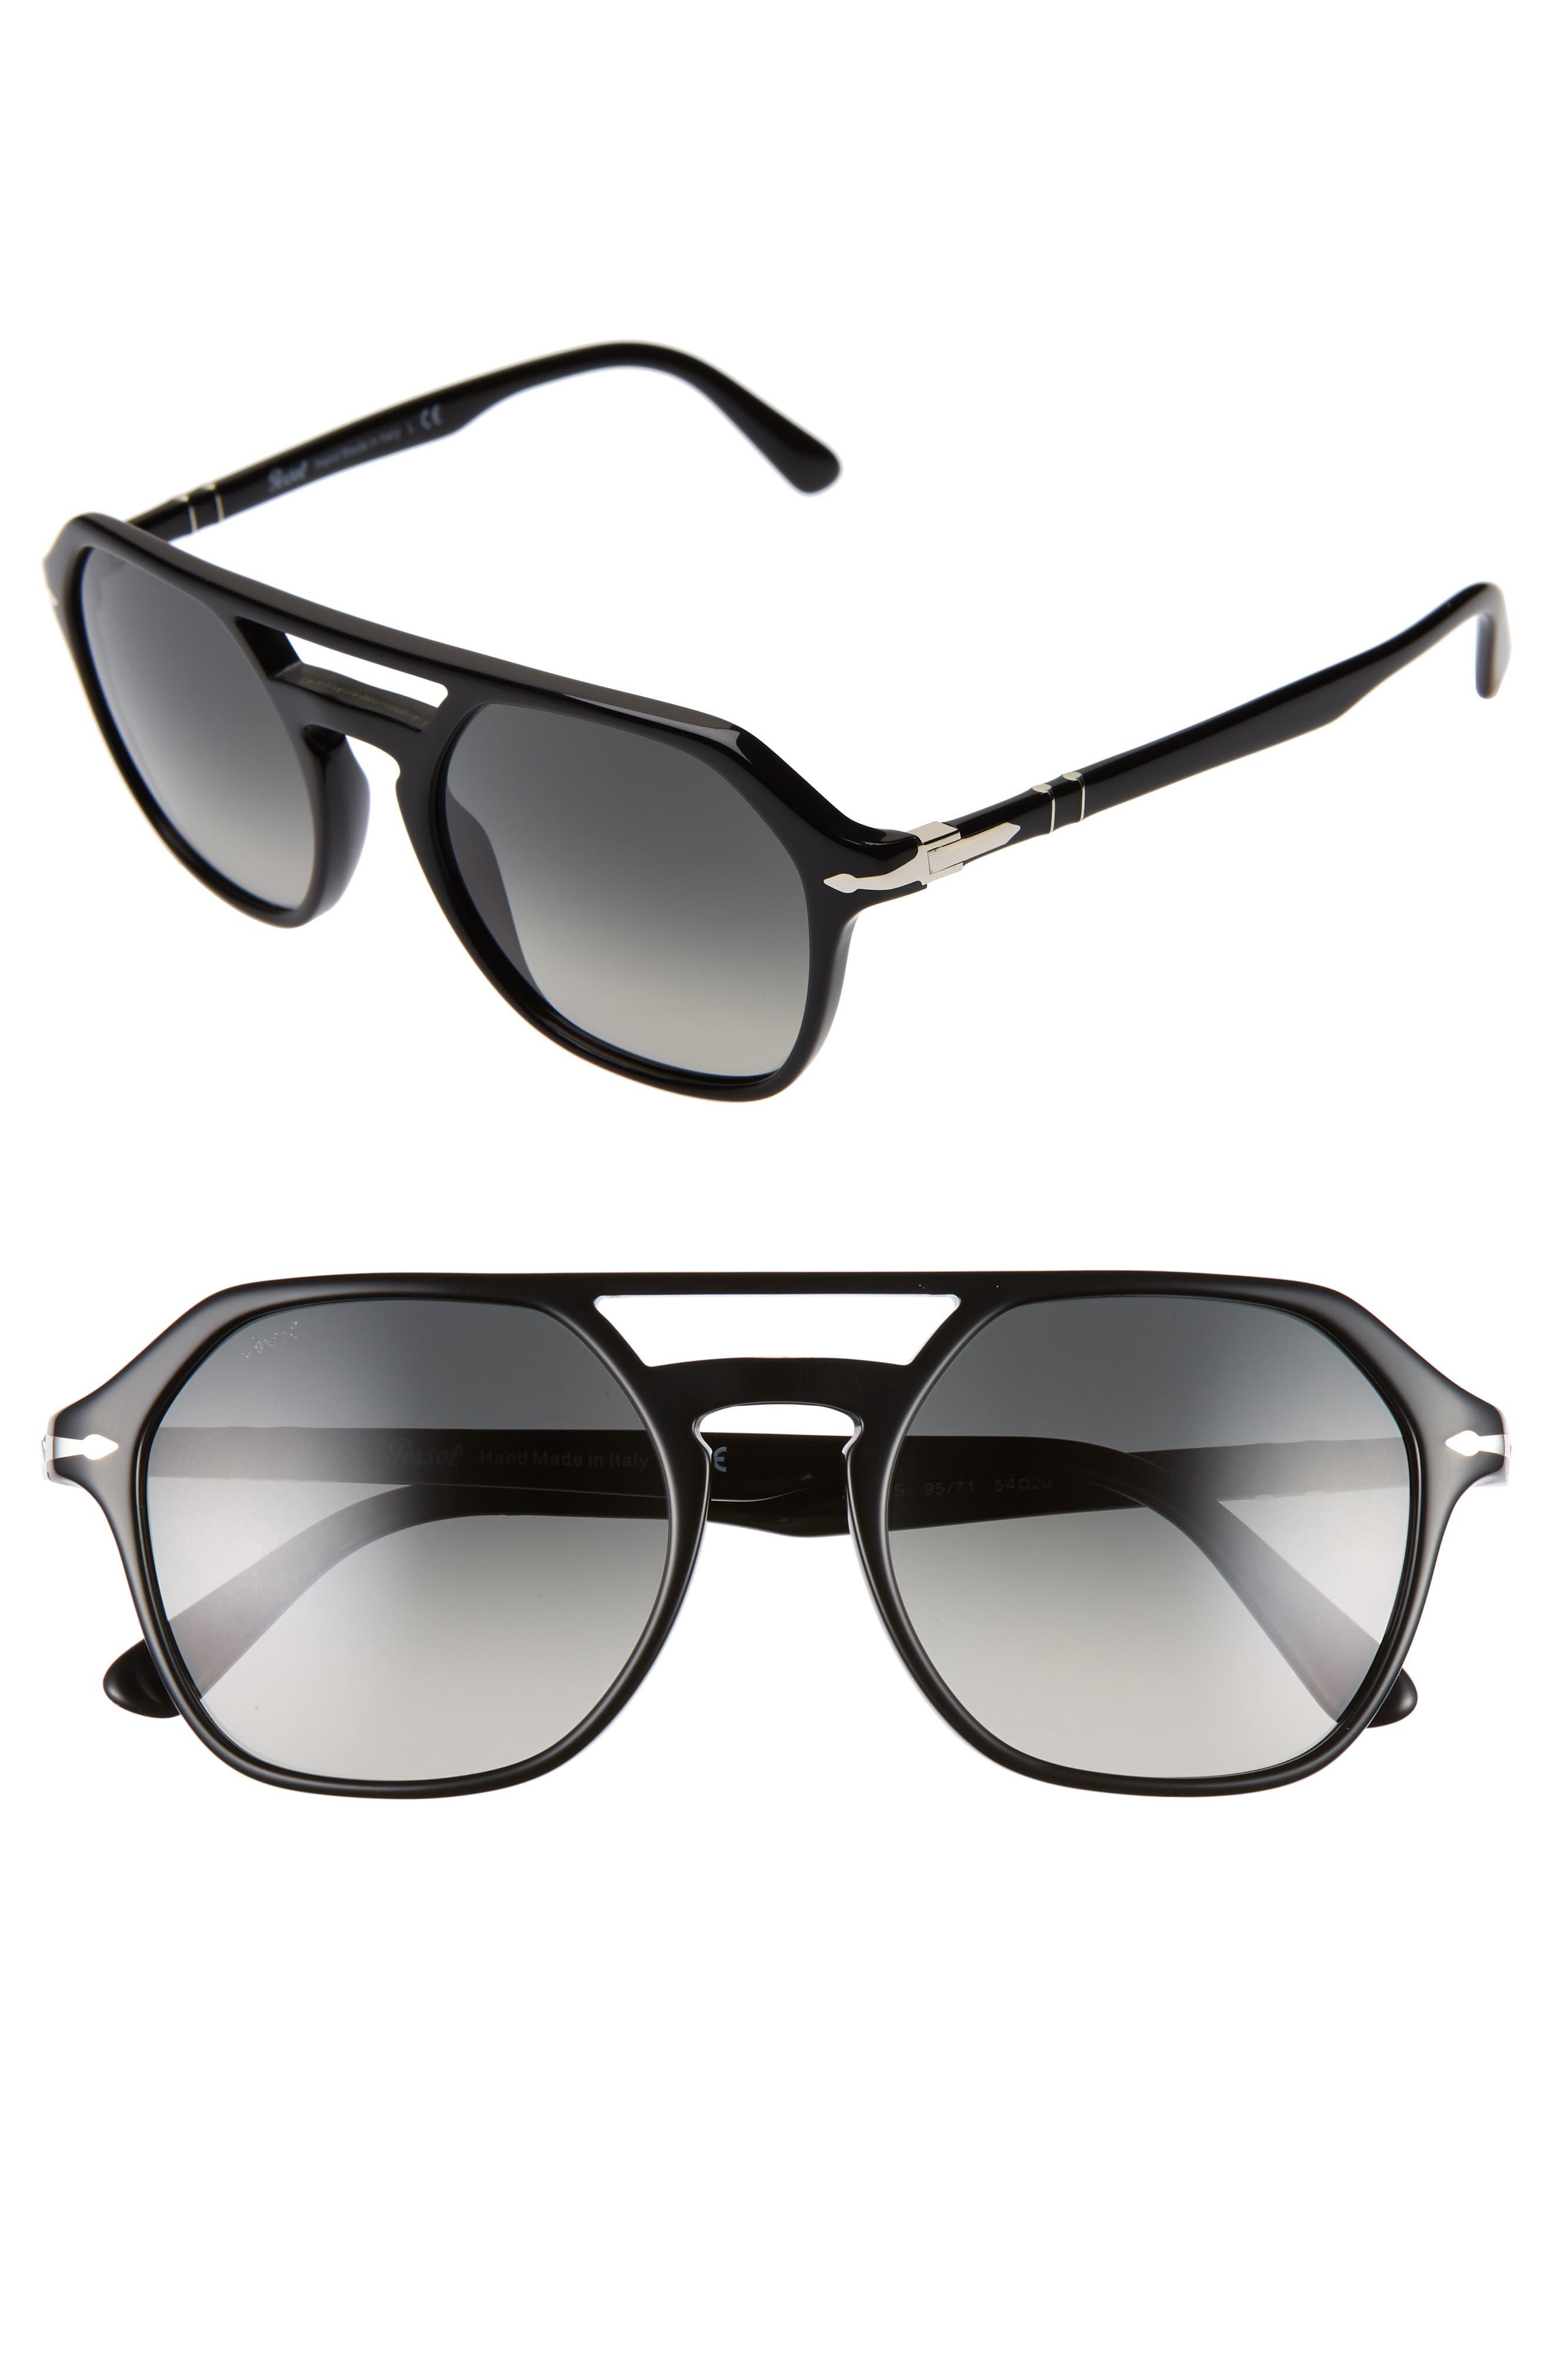 PERSOL,                             54mm Navigator Sunglasses,                             Main thumbnail 1, color,                             BLACK/ GREY GRADIENT